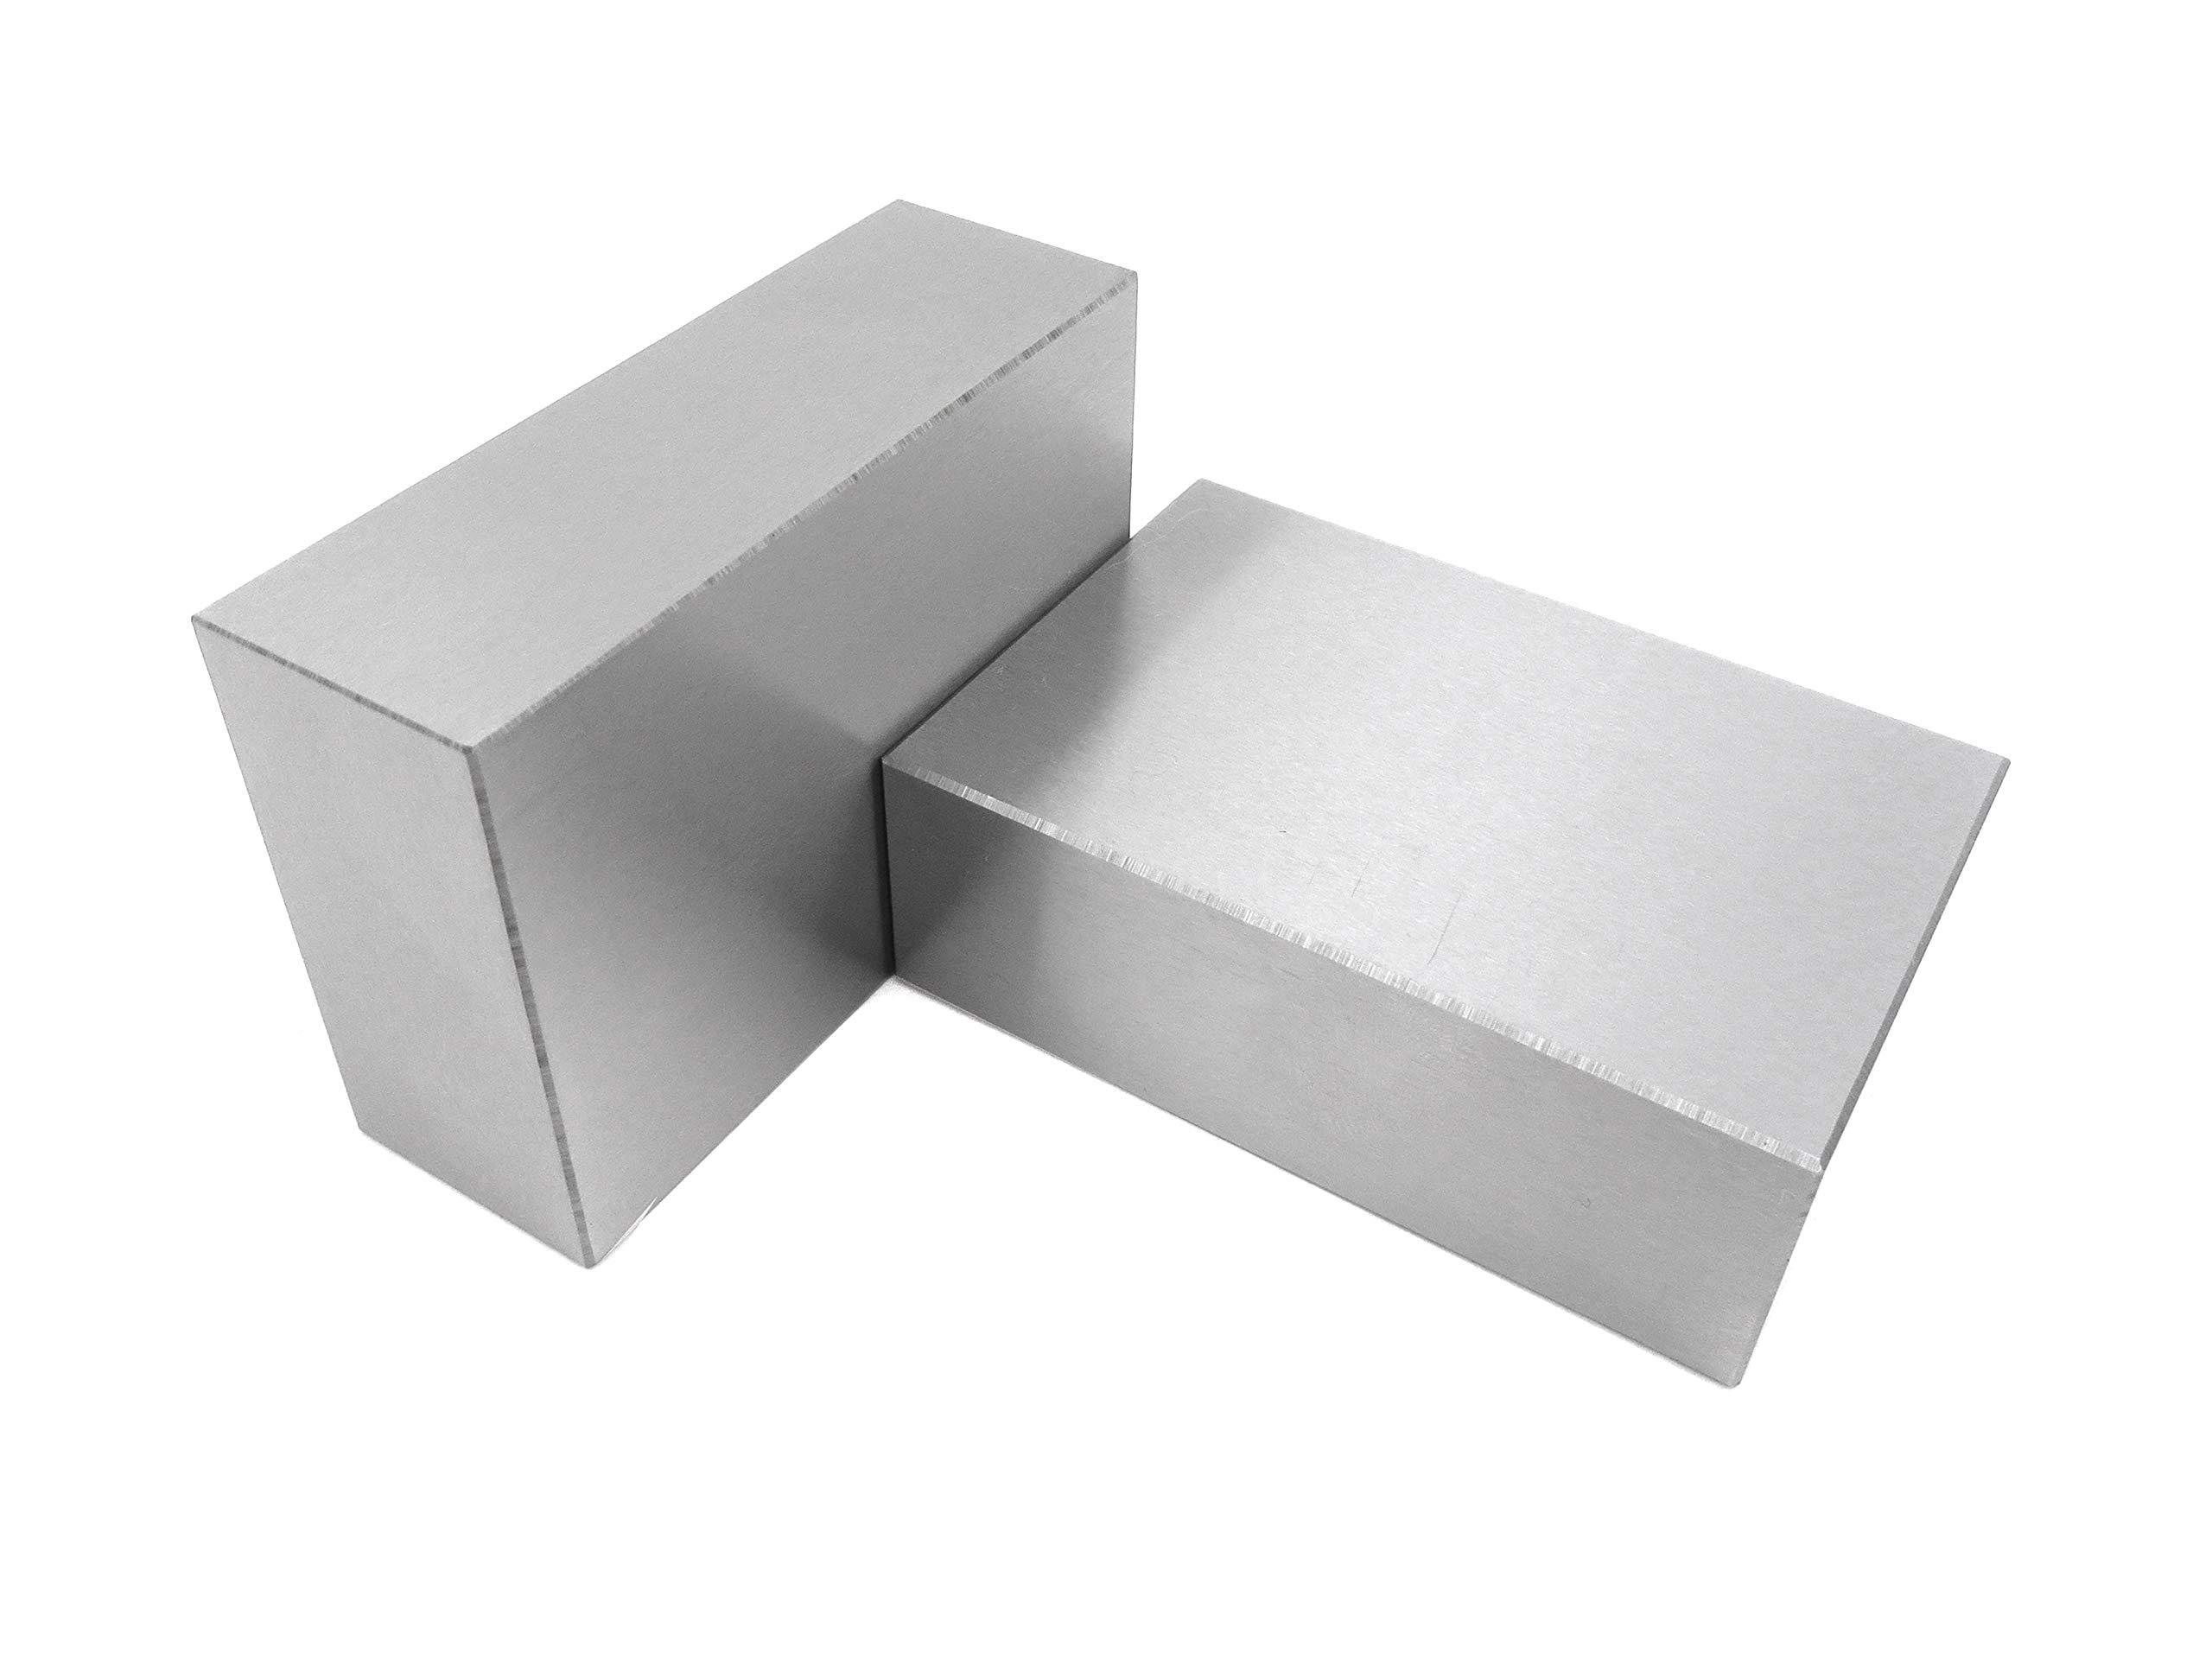 "Taytools 469744 1-2-3 Blocks No Holes Matched Pair (2 Each), Hardened Steel RC 55-62, (1""x2""x3"") 123 Precision Ground Machinist Set Up Blocks"